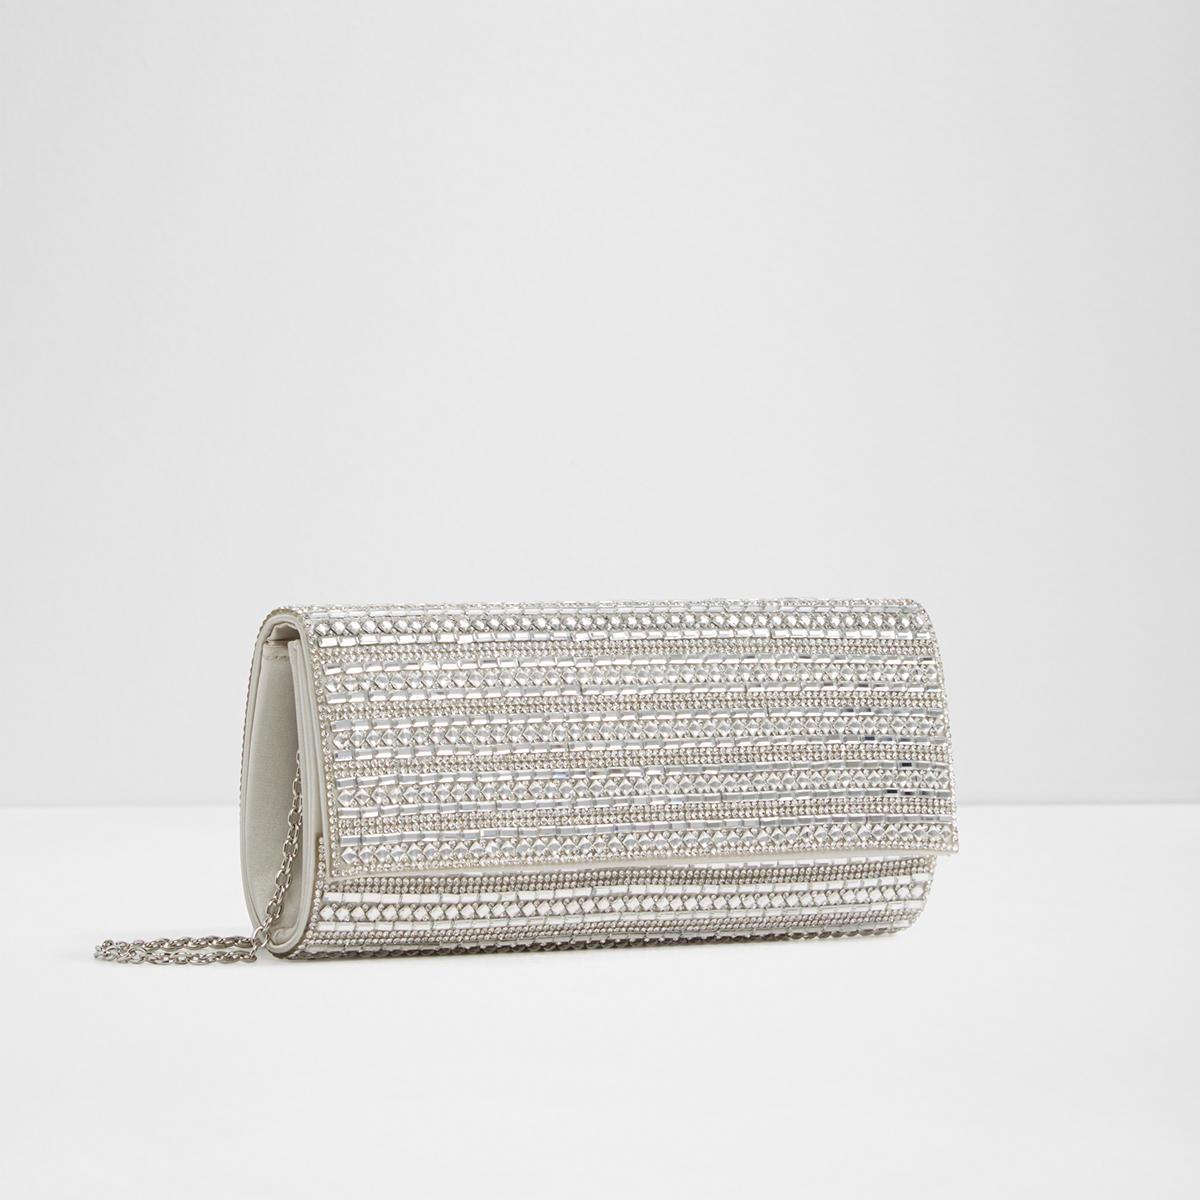 965fcfc68e0 Bascemi Silver Women S Clutches Evening Bags Aldo Canada. Aldo Embellished  Clutch Bag